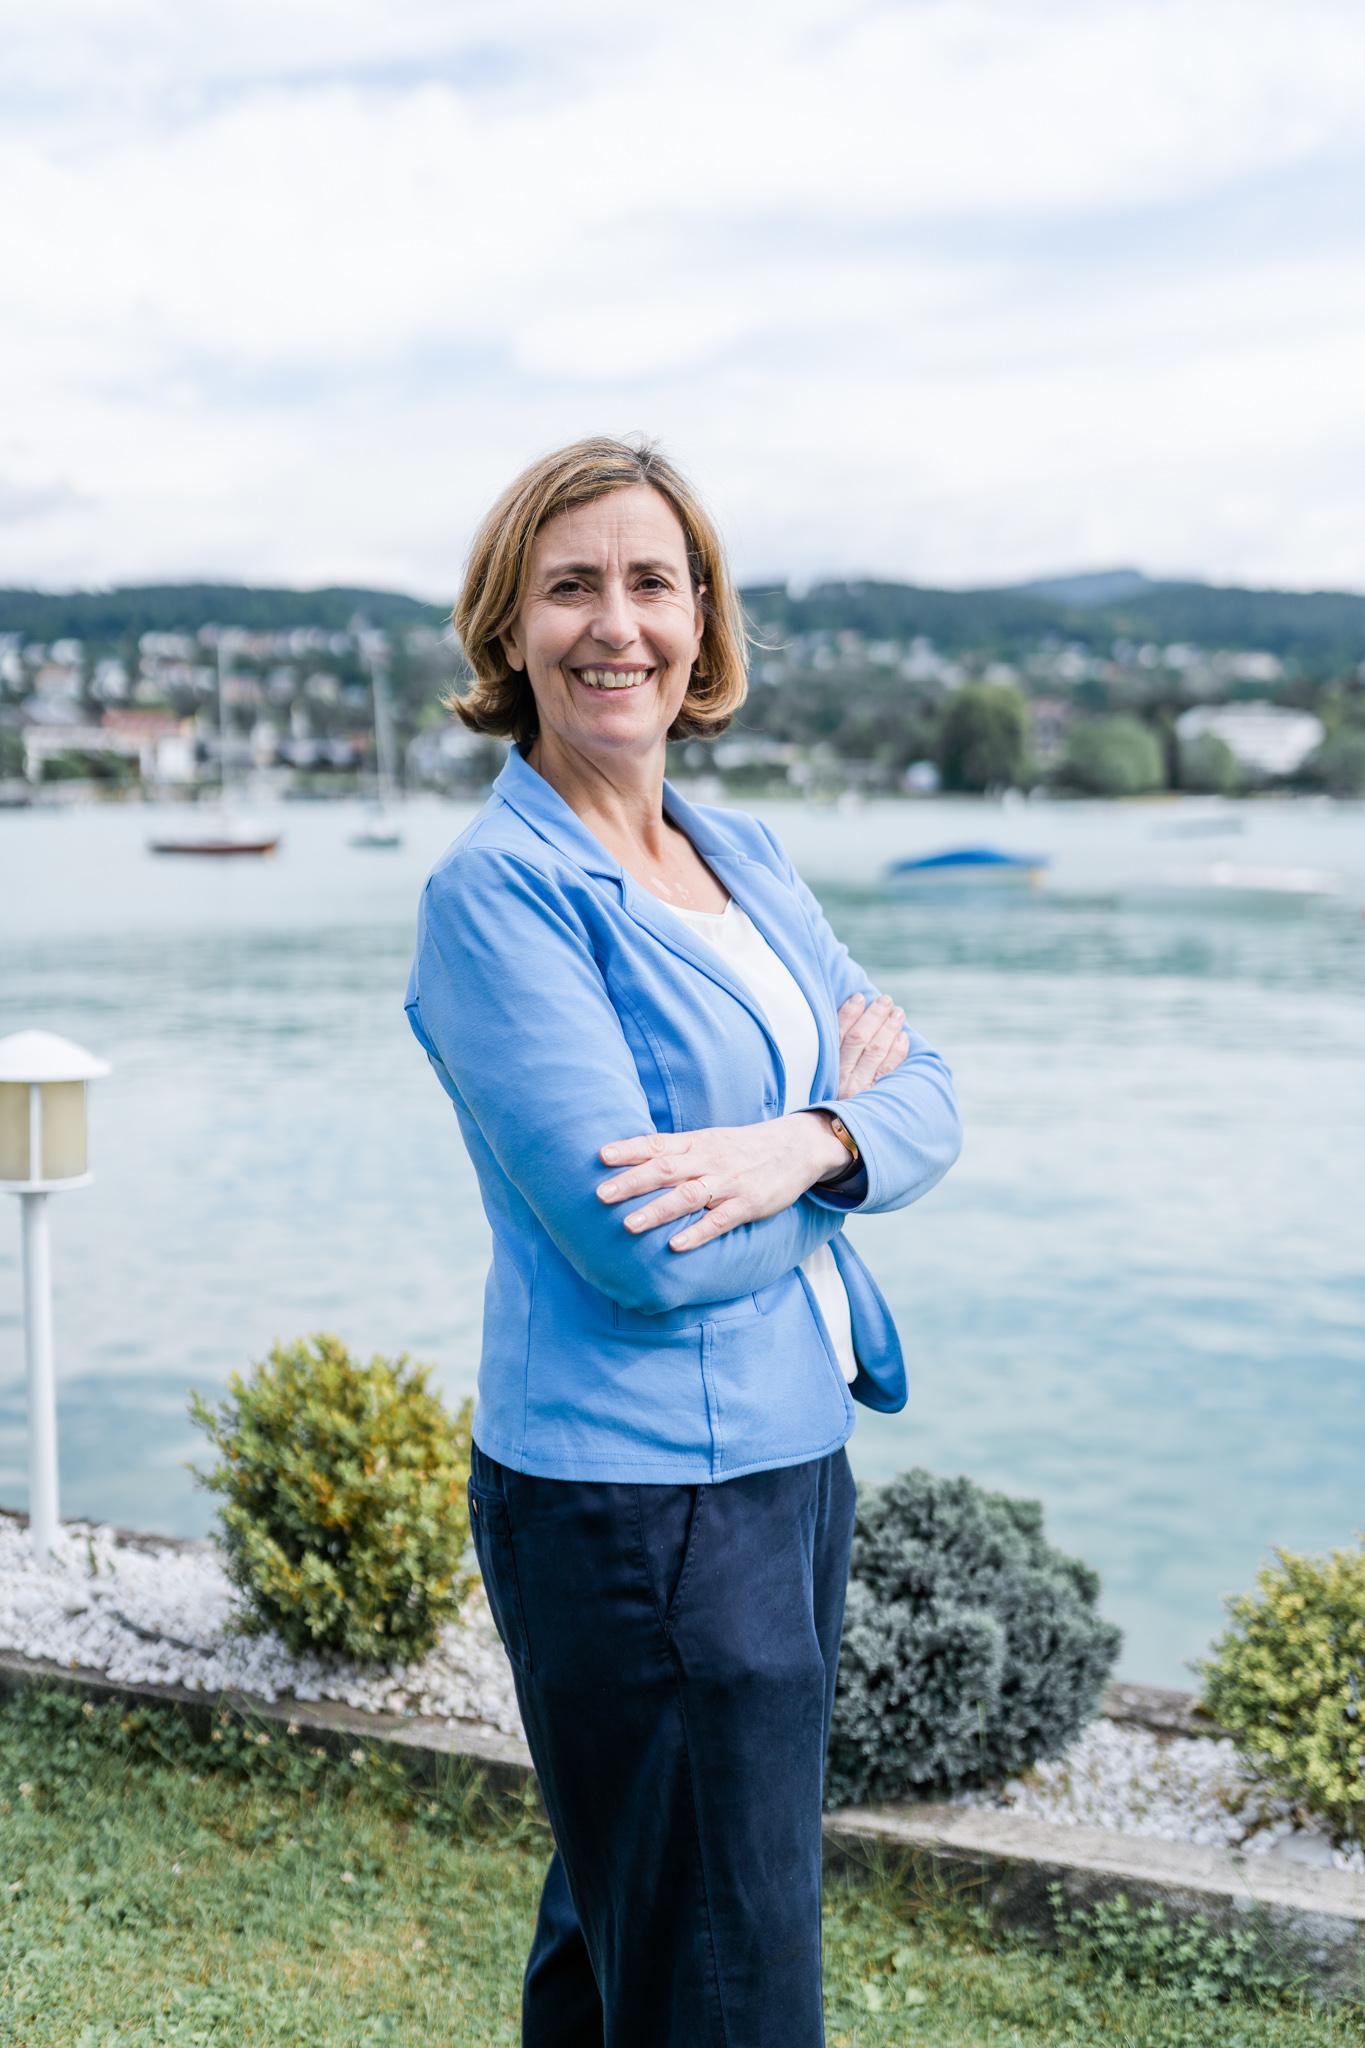 Claudia Reibnegger Seebnb